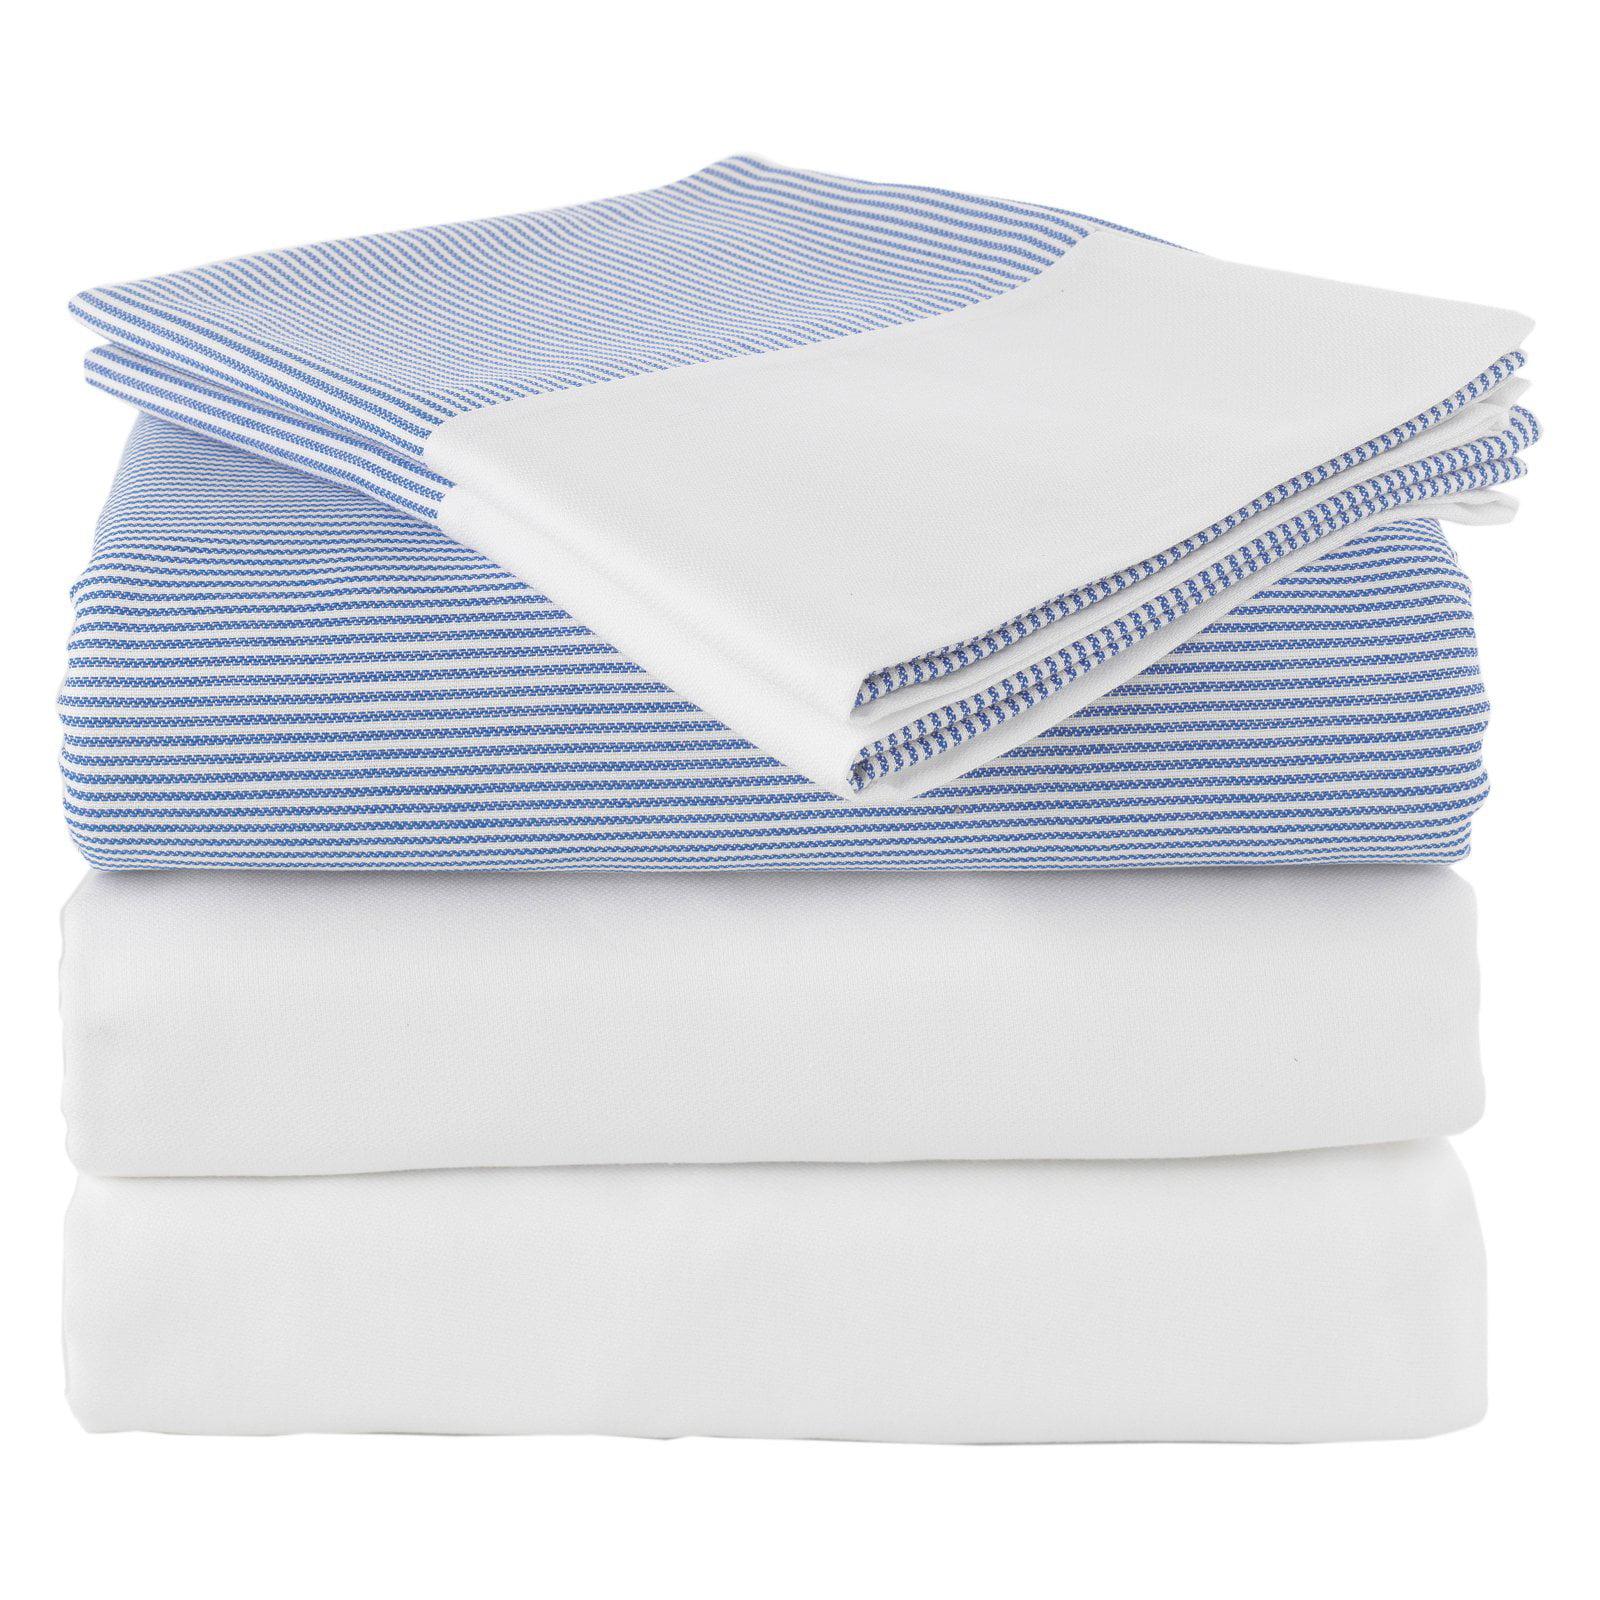 Linum Home Textiles Chevas Luxury Stripe 100% Turkish Cotton 5-Piece Duvet Cover and 300 Thread Count Sheet Set